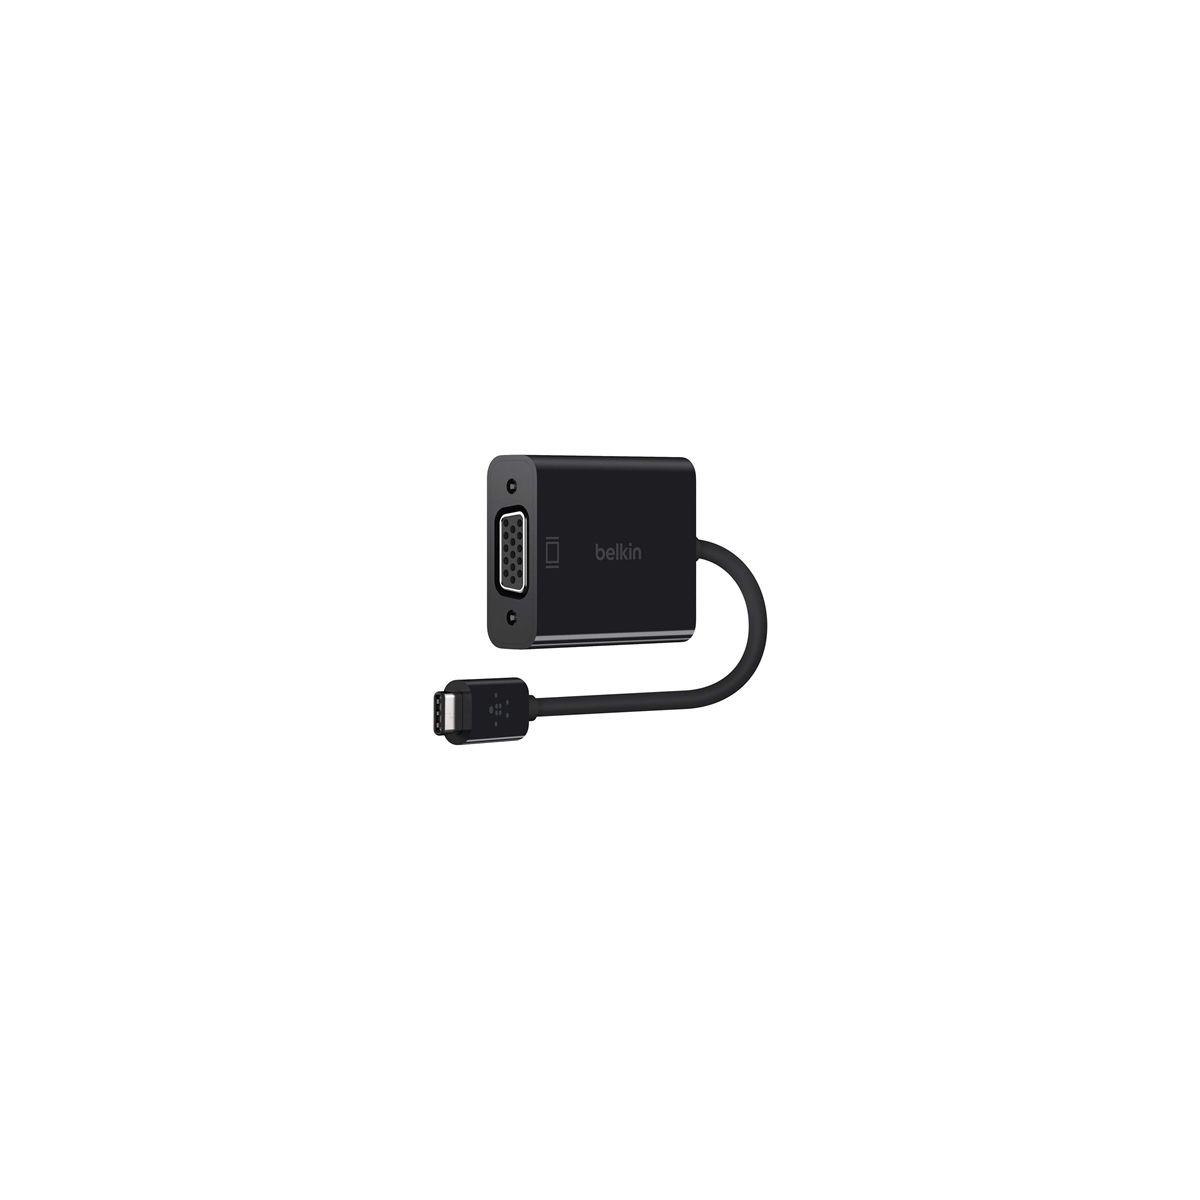 Adaptateur VGA BELKIN Adaptateur USB-C / VGA - Noir (photo)